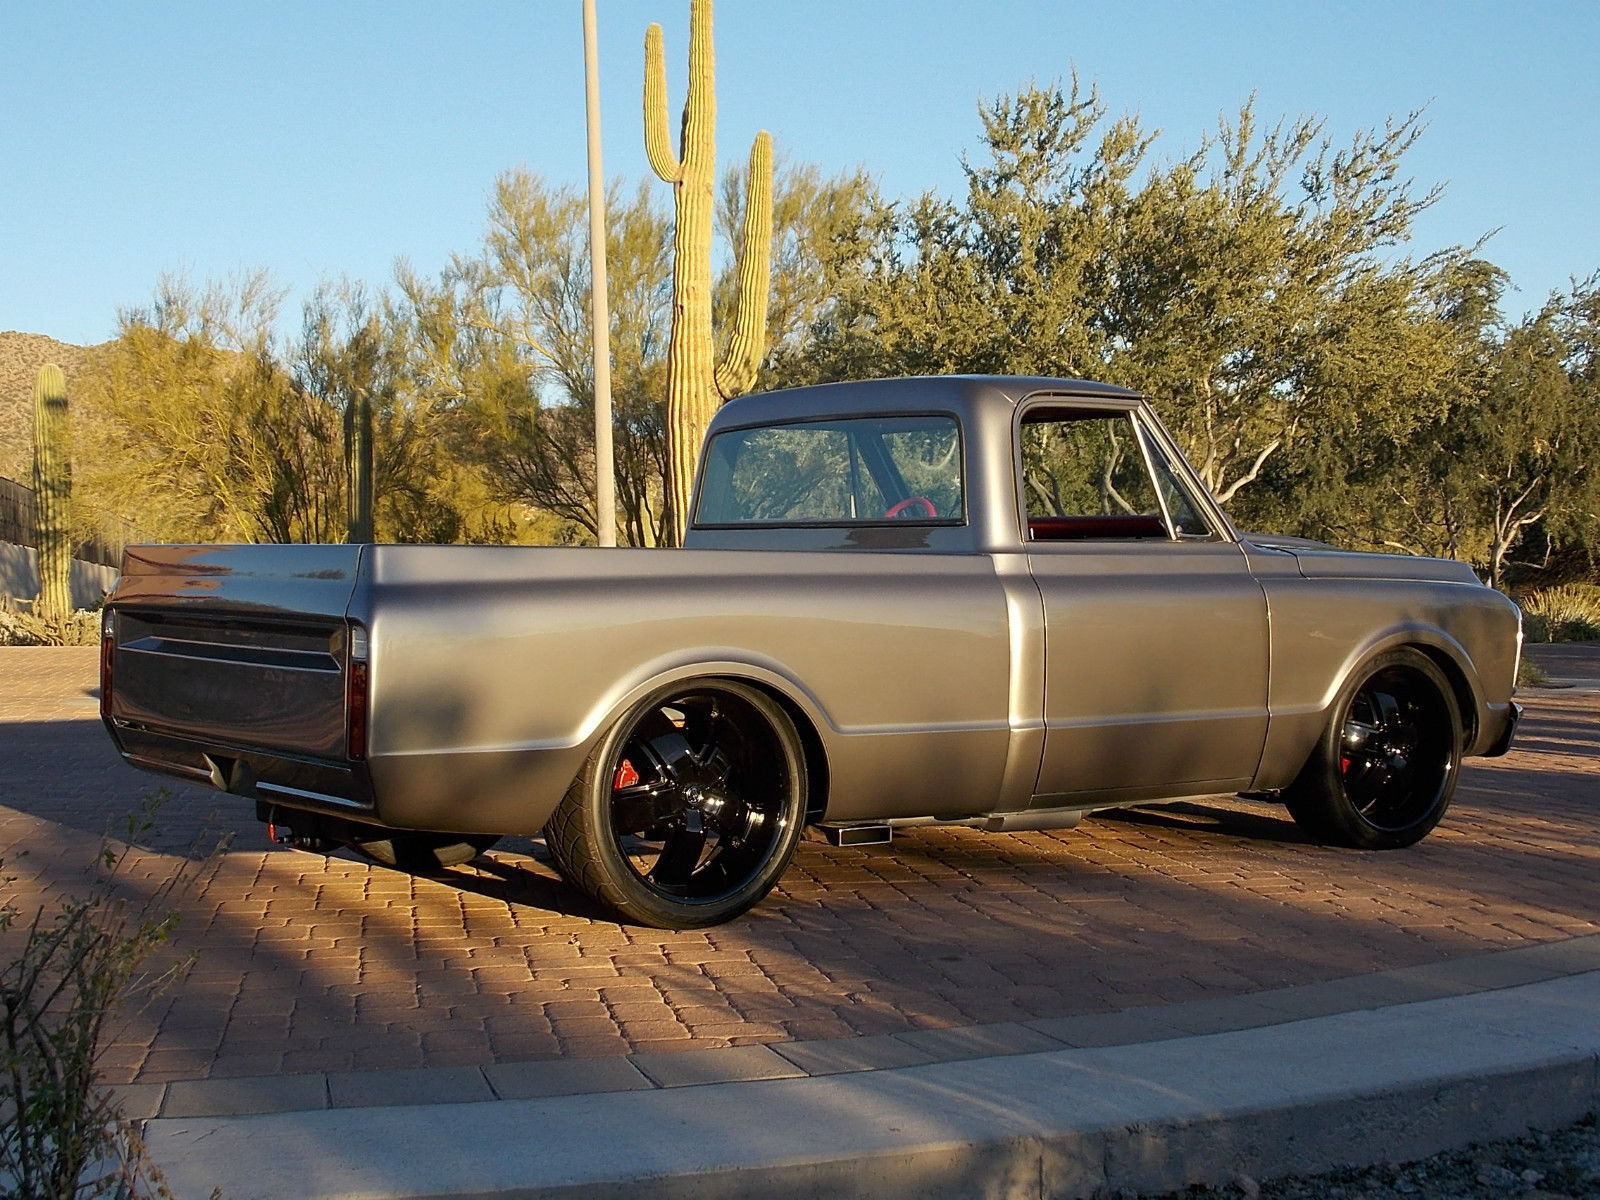 1969 chevrolet c10 454 pro touring arizona rust free show truck for sale in mesa arizona. Black Bedroom Furniture Sets. Home Design Ideas